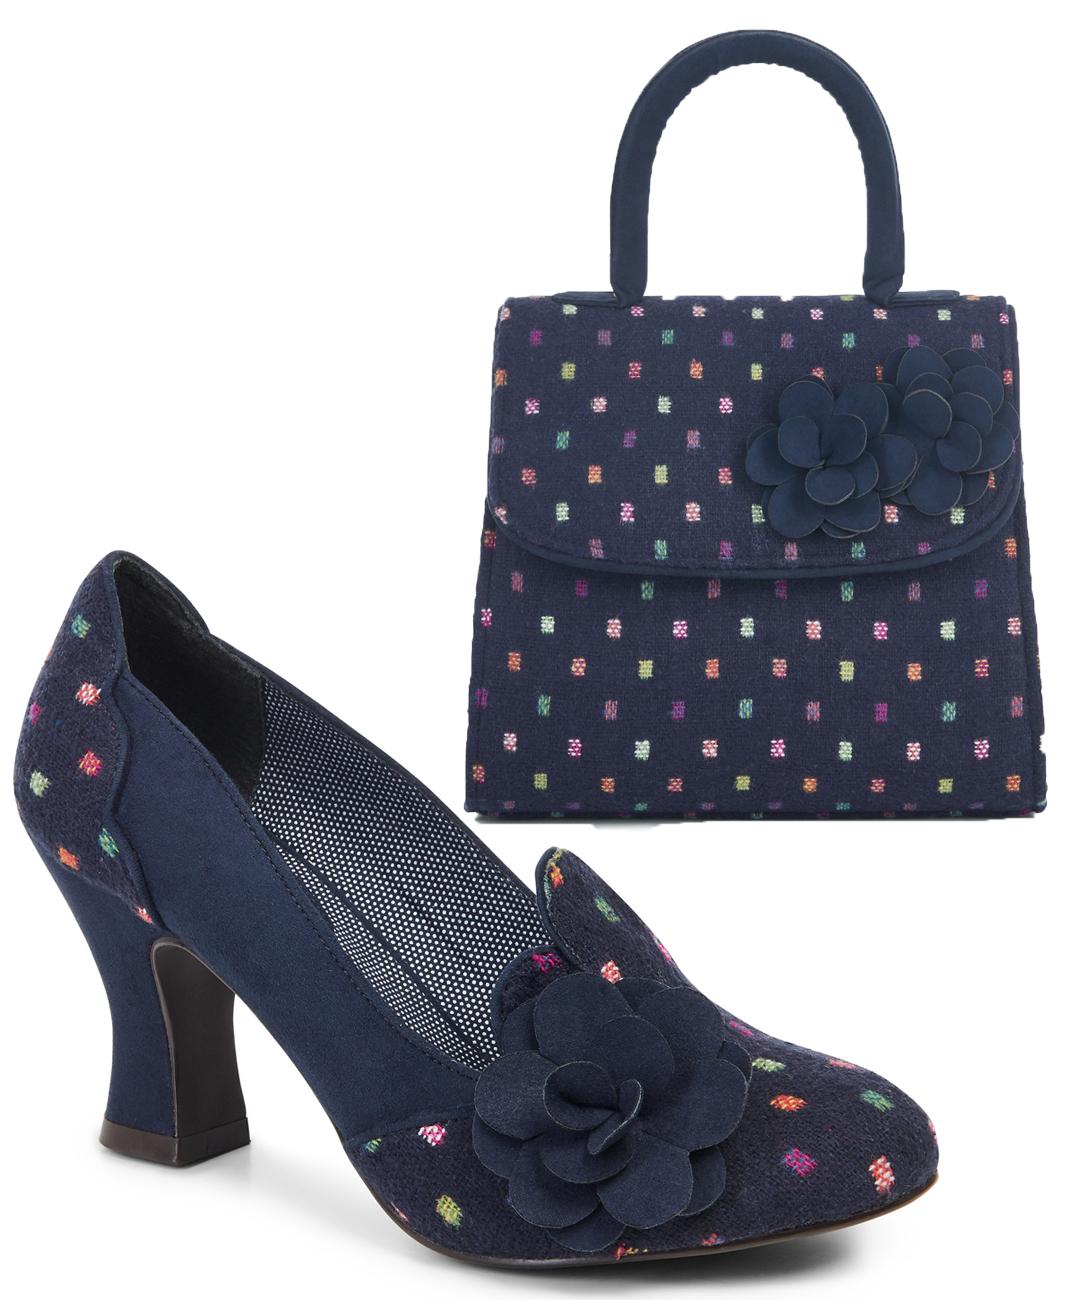 850fd3c7757b Ruby Shoo Lola Tweed Court Shoes   Matching Kingston Bag UK3-9 EU36 ...